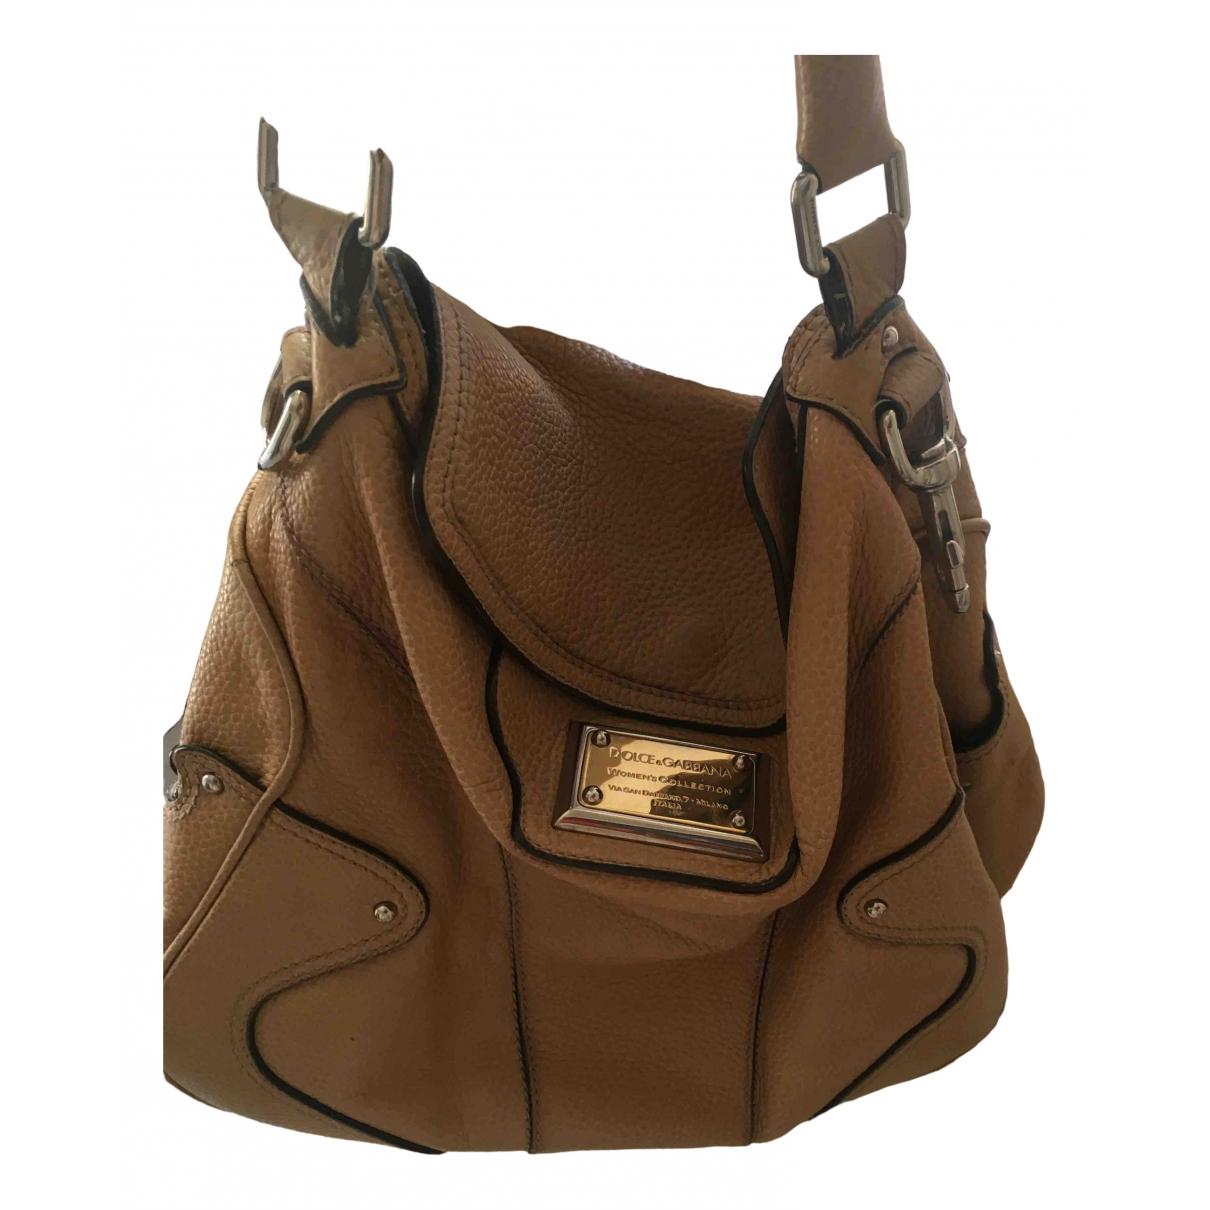 Dolce & Gabbana \N Yellow Leather handbag for Women \N